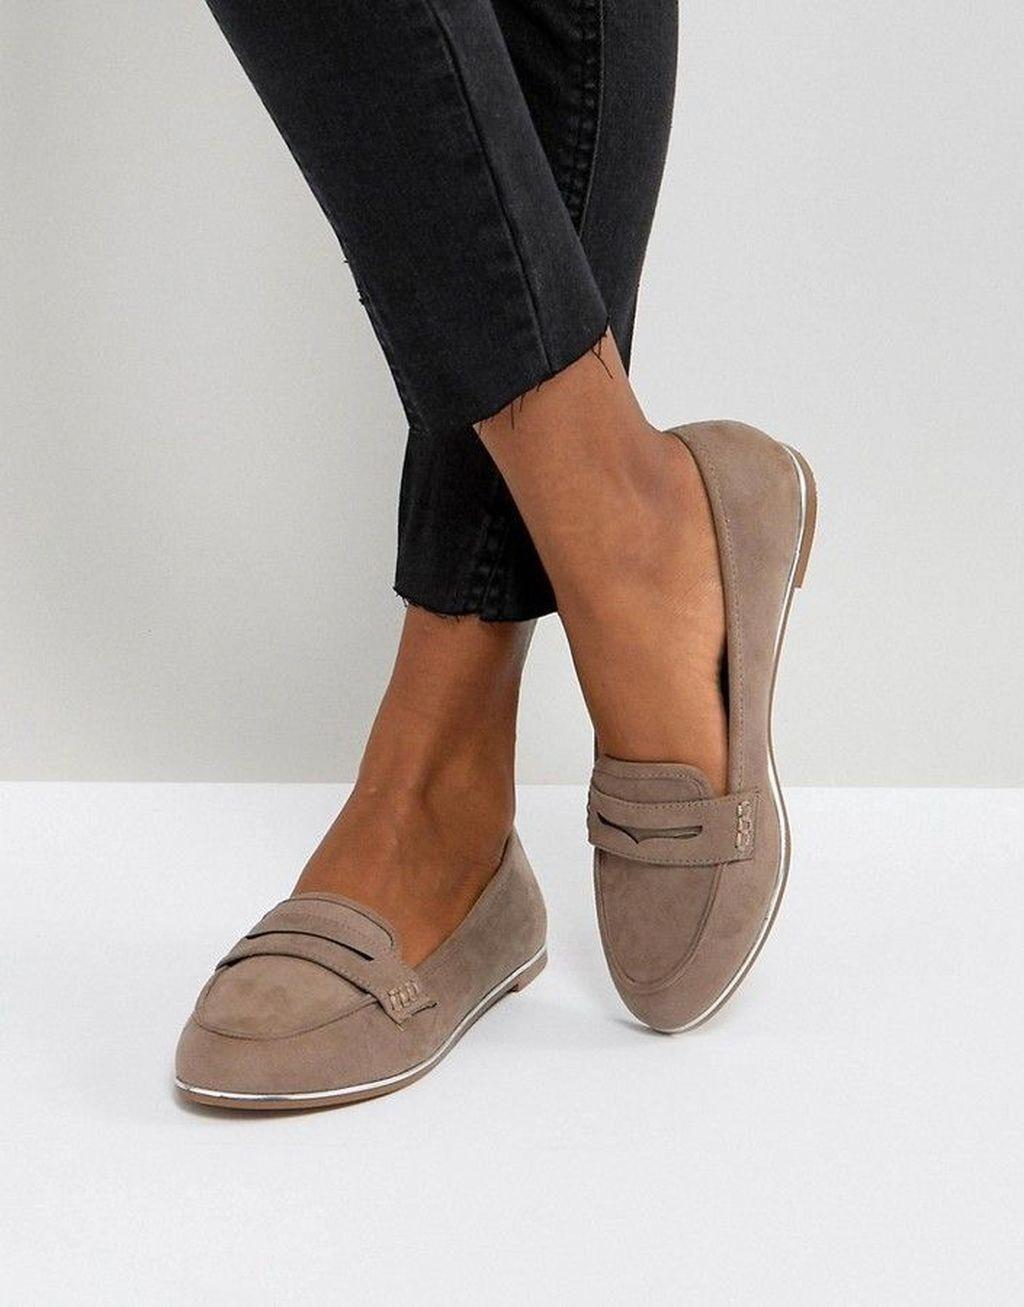 Kmart Womens Work Shoes | Dress shoes